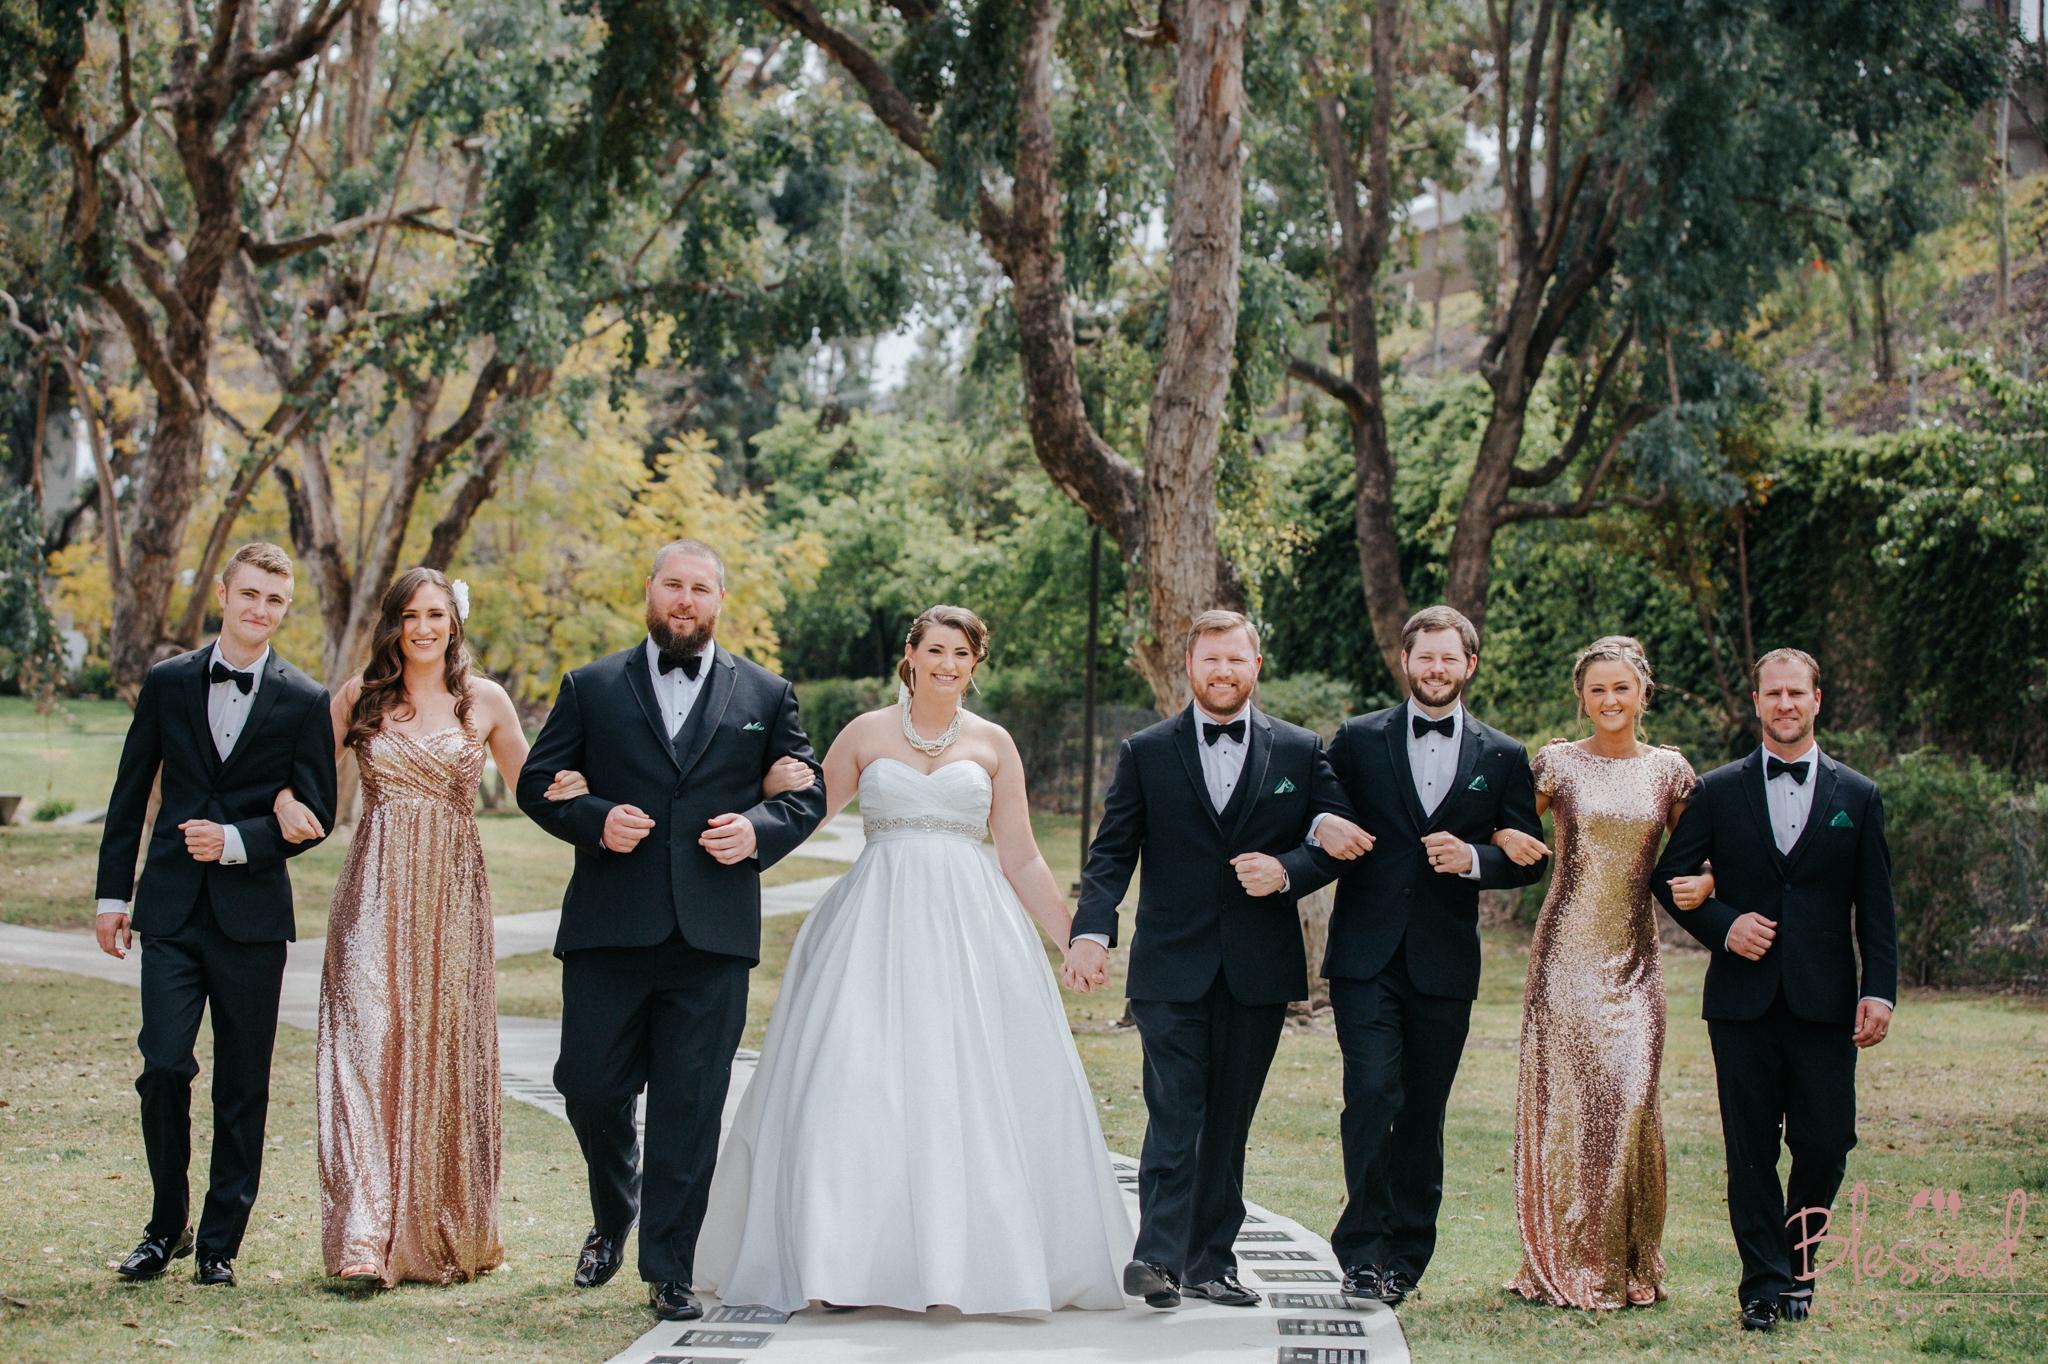 Orfila Vinery Wedding by Blessed Wedding Photography 29.jpg